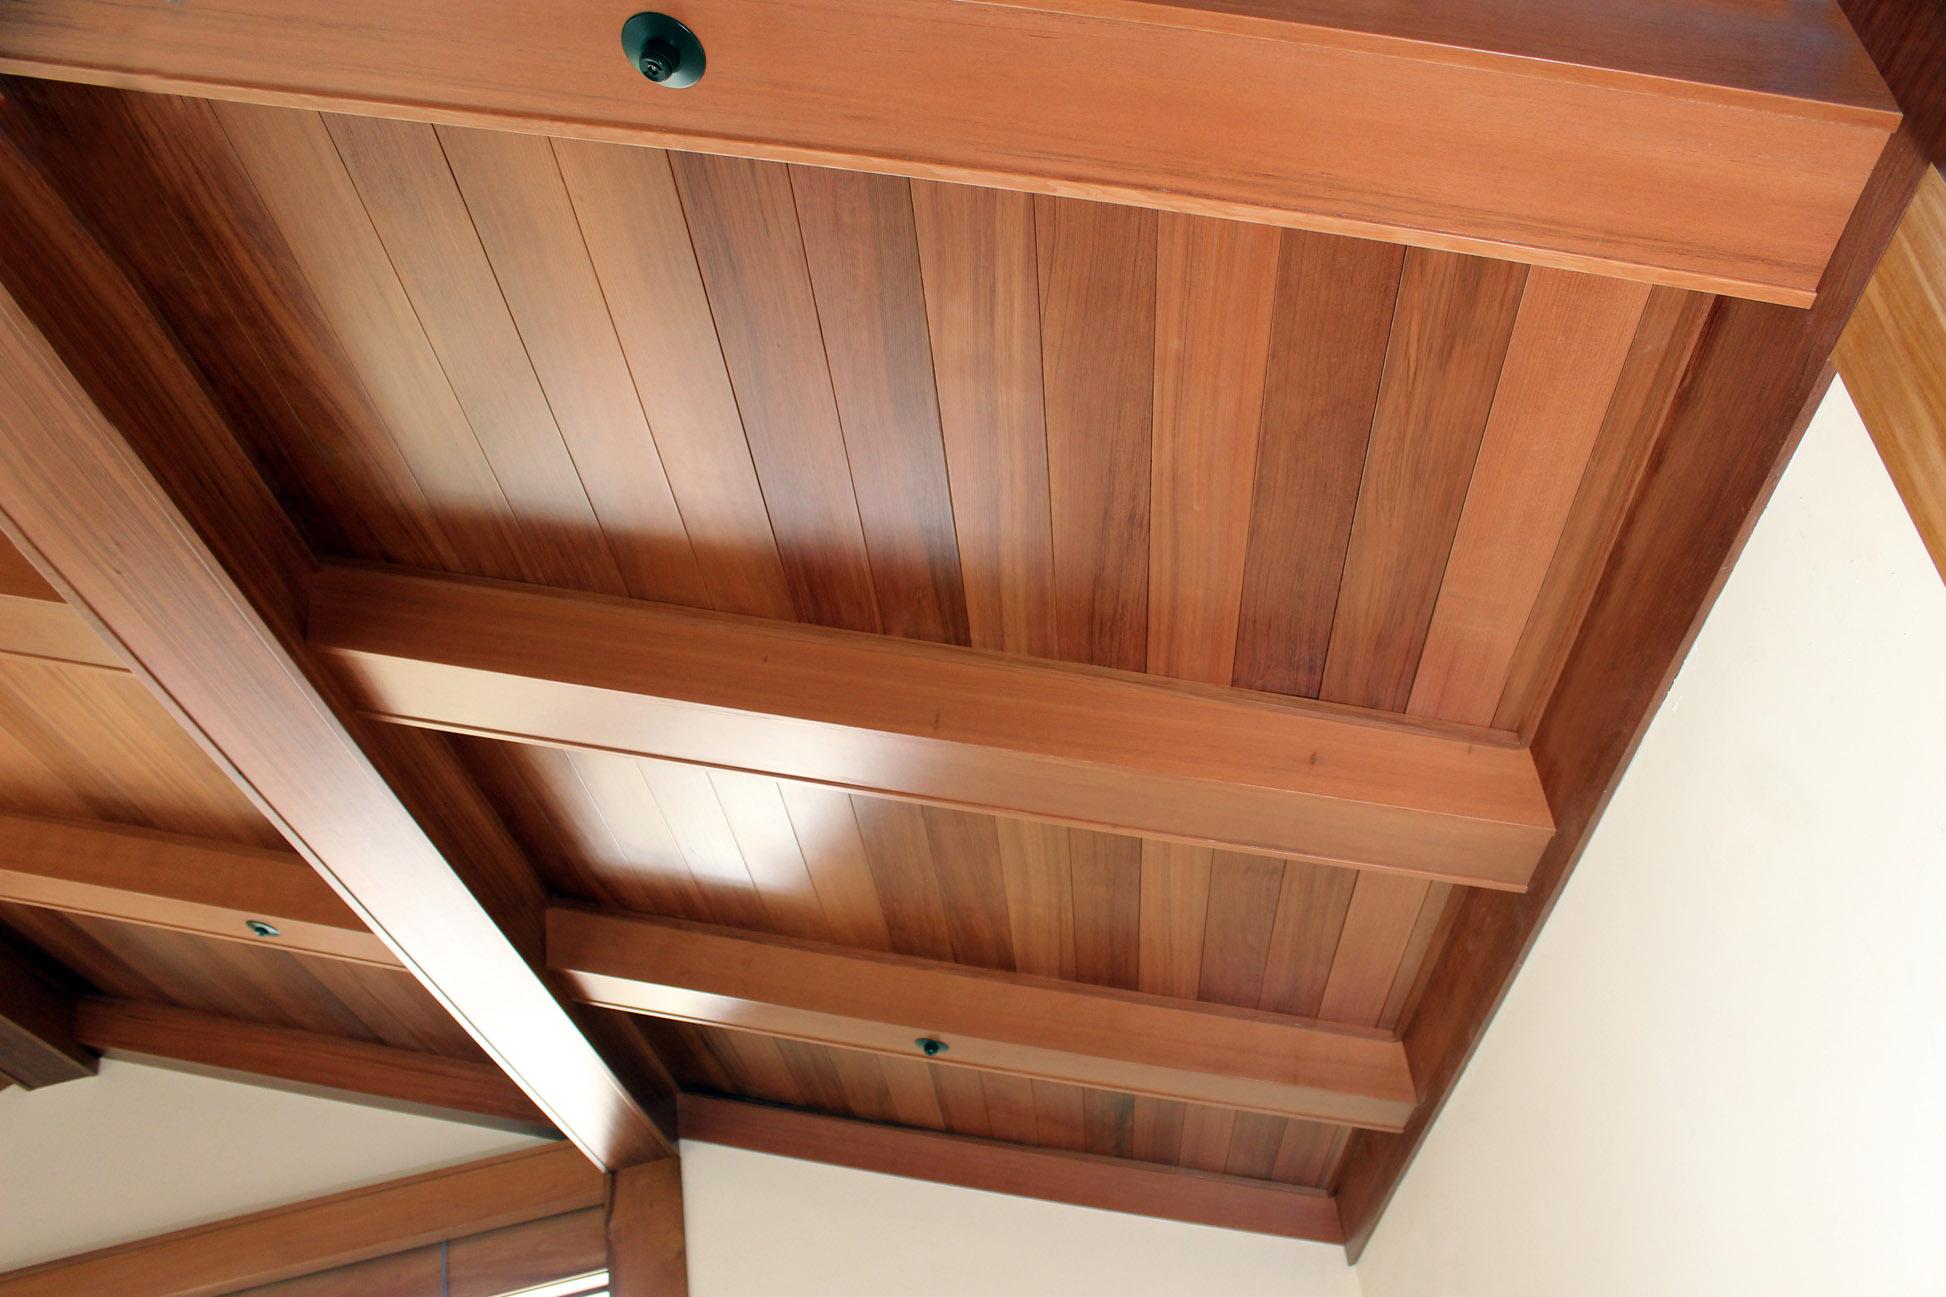 box beams 2 - jackel enterprises, inc. wood that is meant to